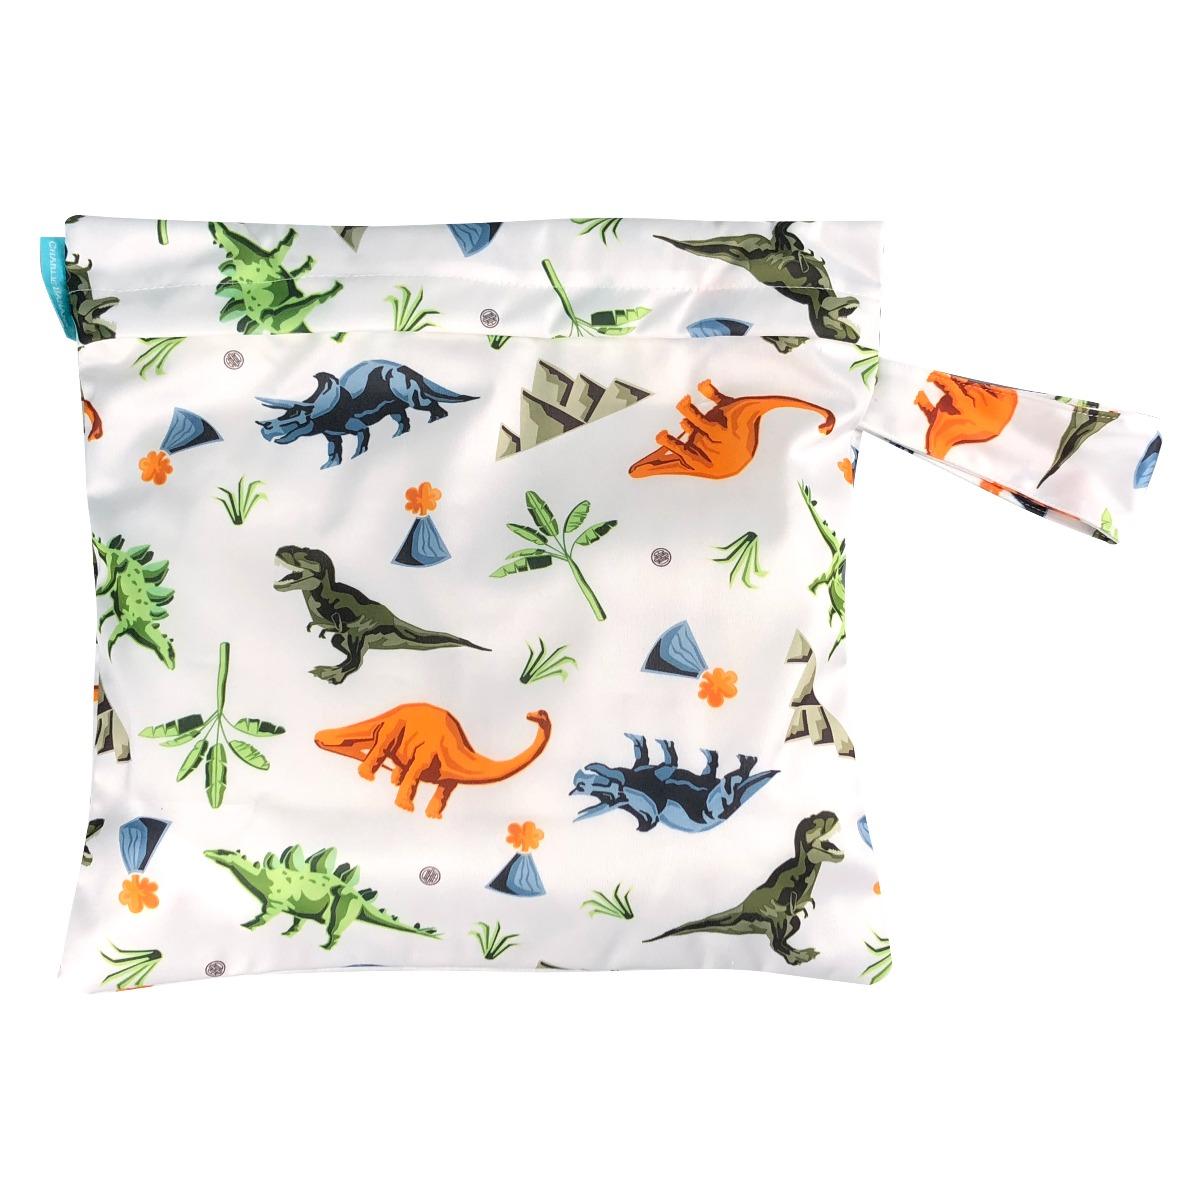 Windelbeutel Dinosaurs